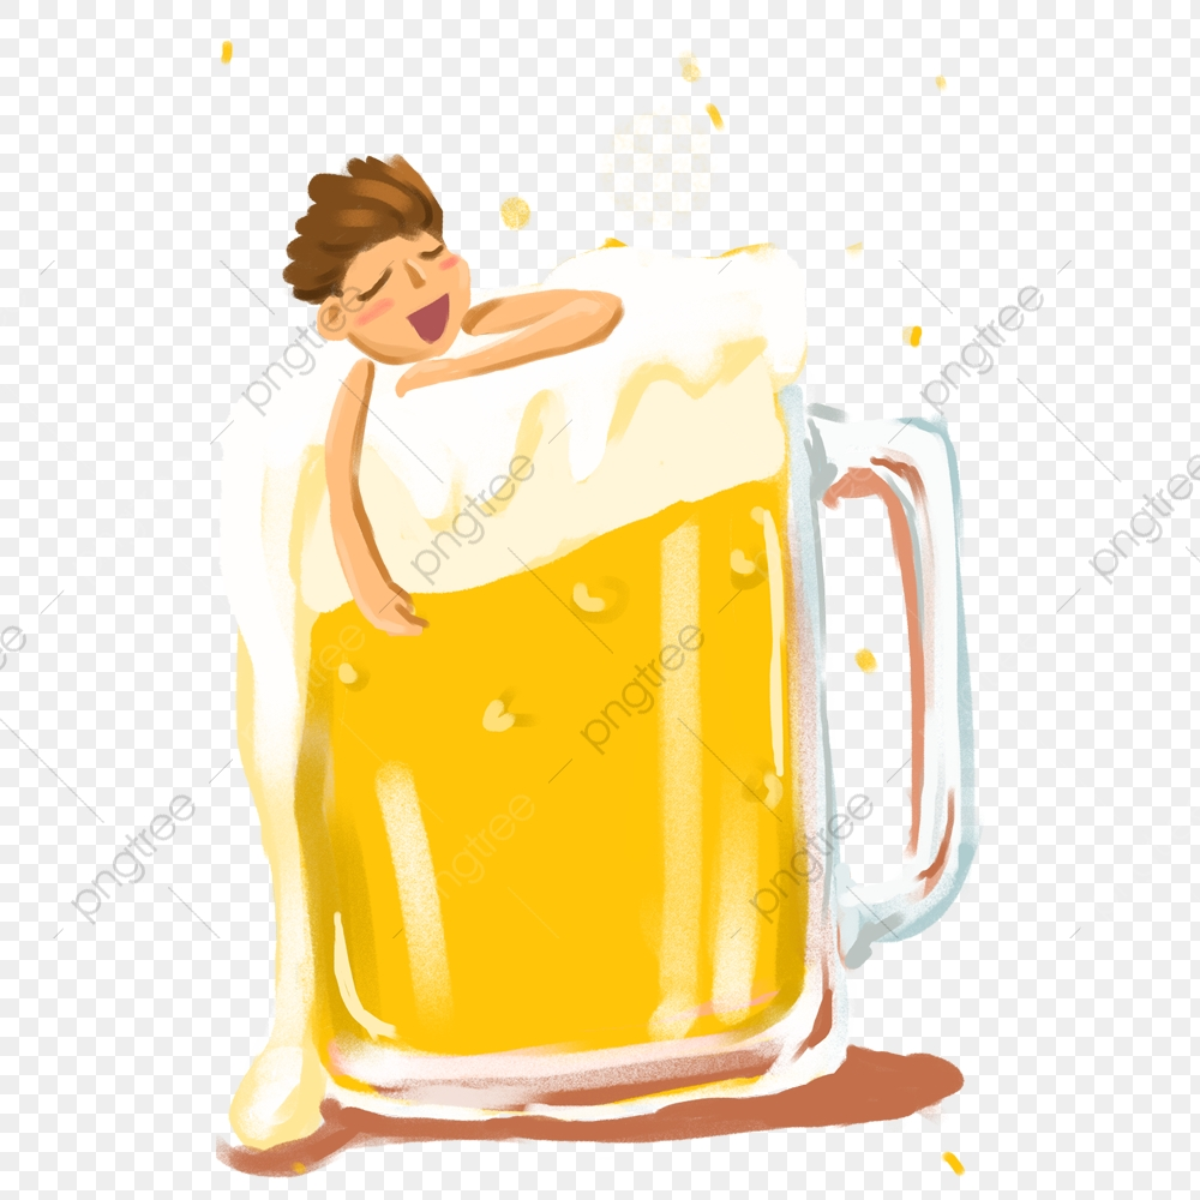 Cartoon Beer Mug Character Beer Beer Foam Beer Festival Drink Png Transparent Clipart Image And Psd File For Free Download